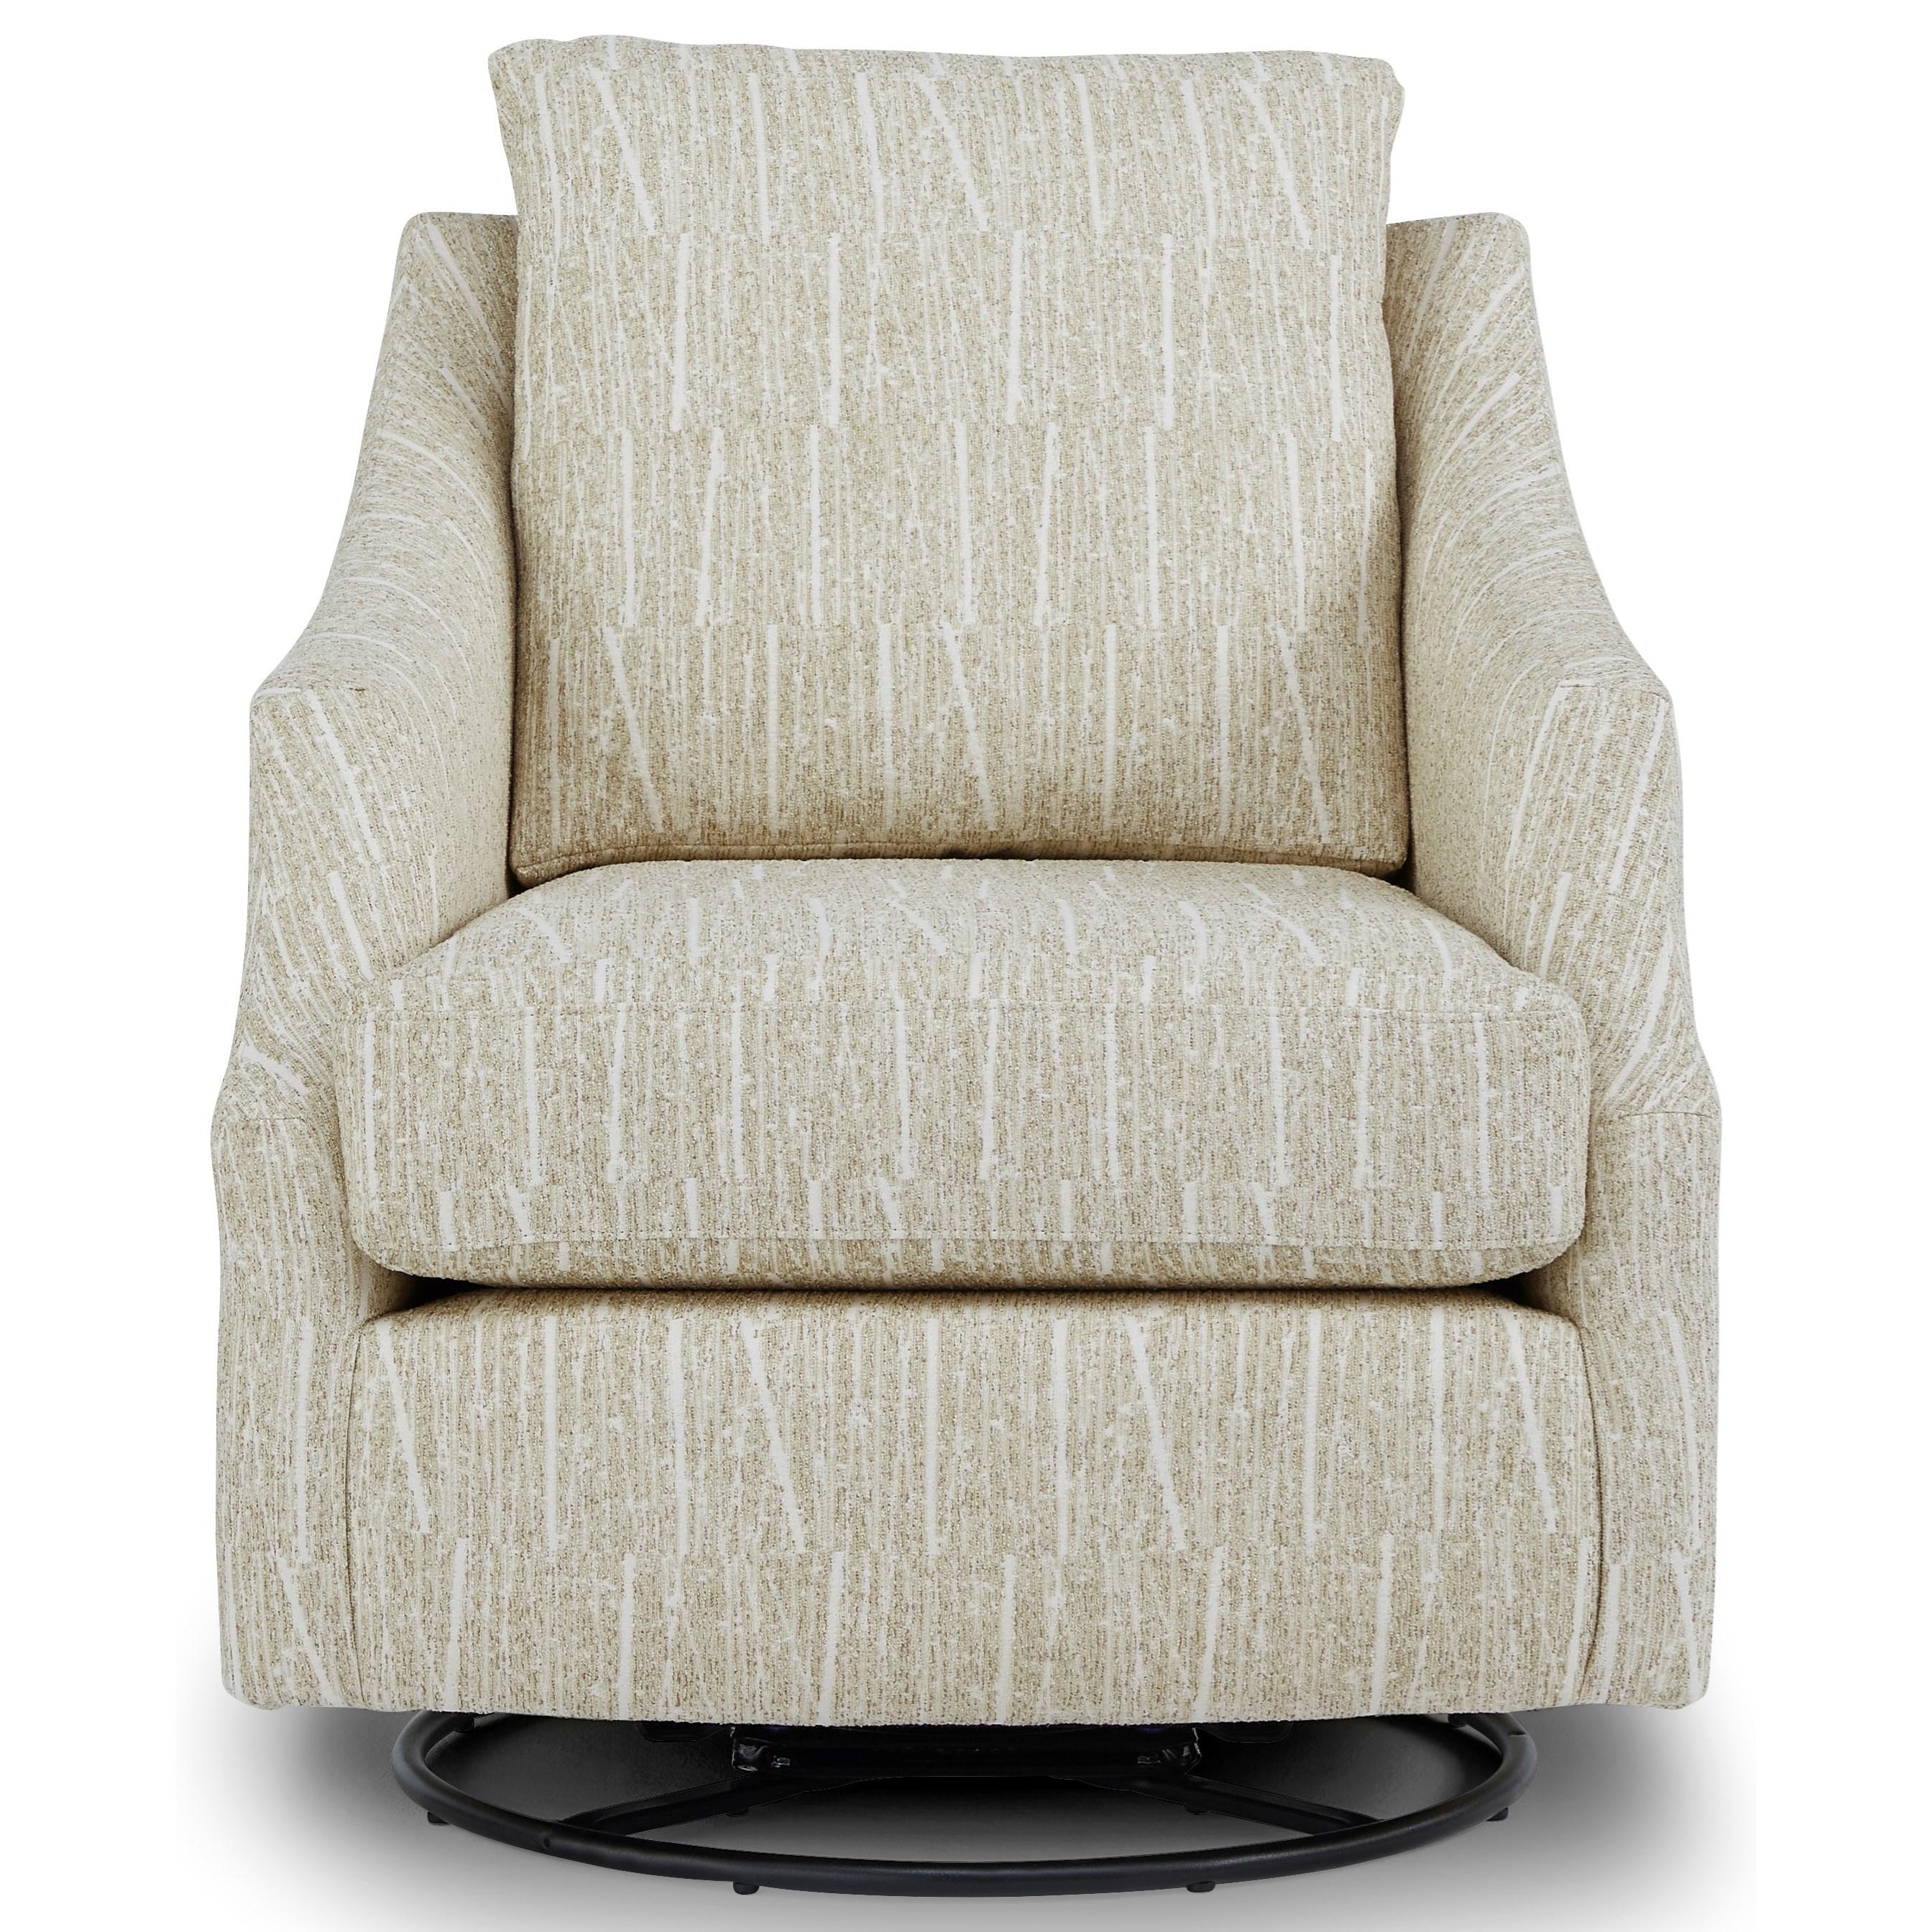 Flutter Swivel Glider by Best Home Furnishings at Walker's Furniture